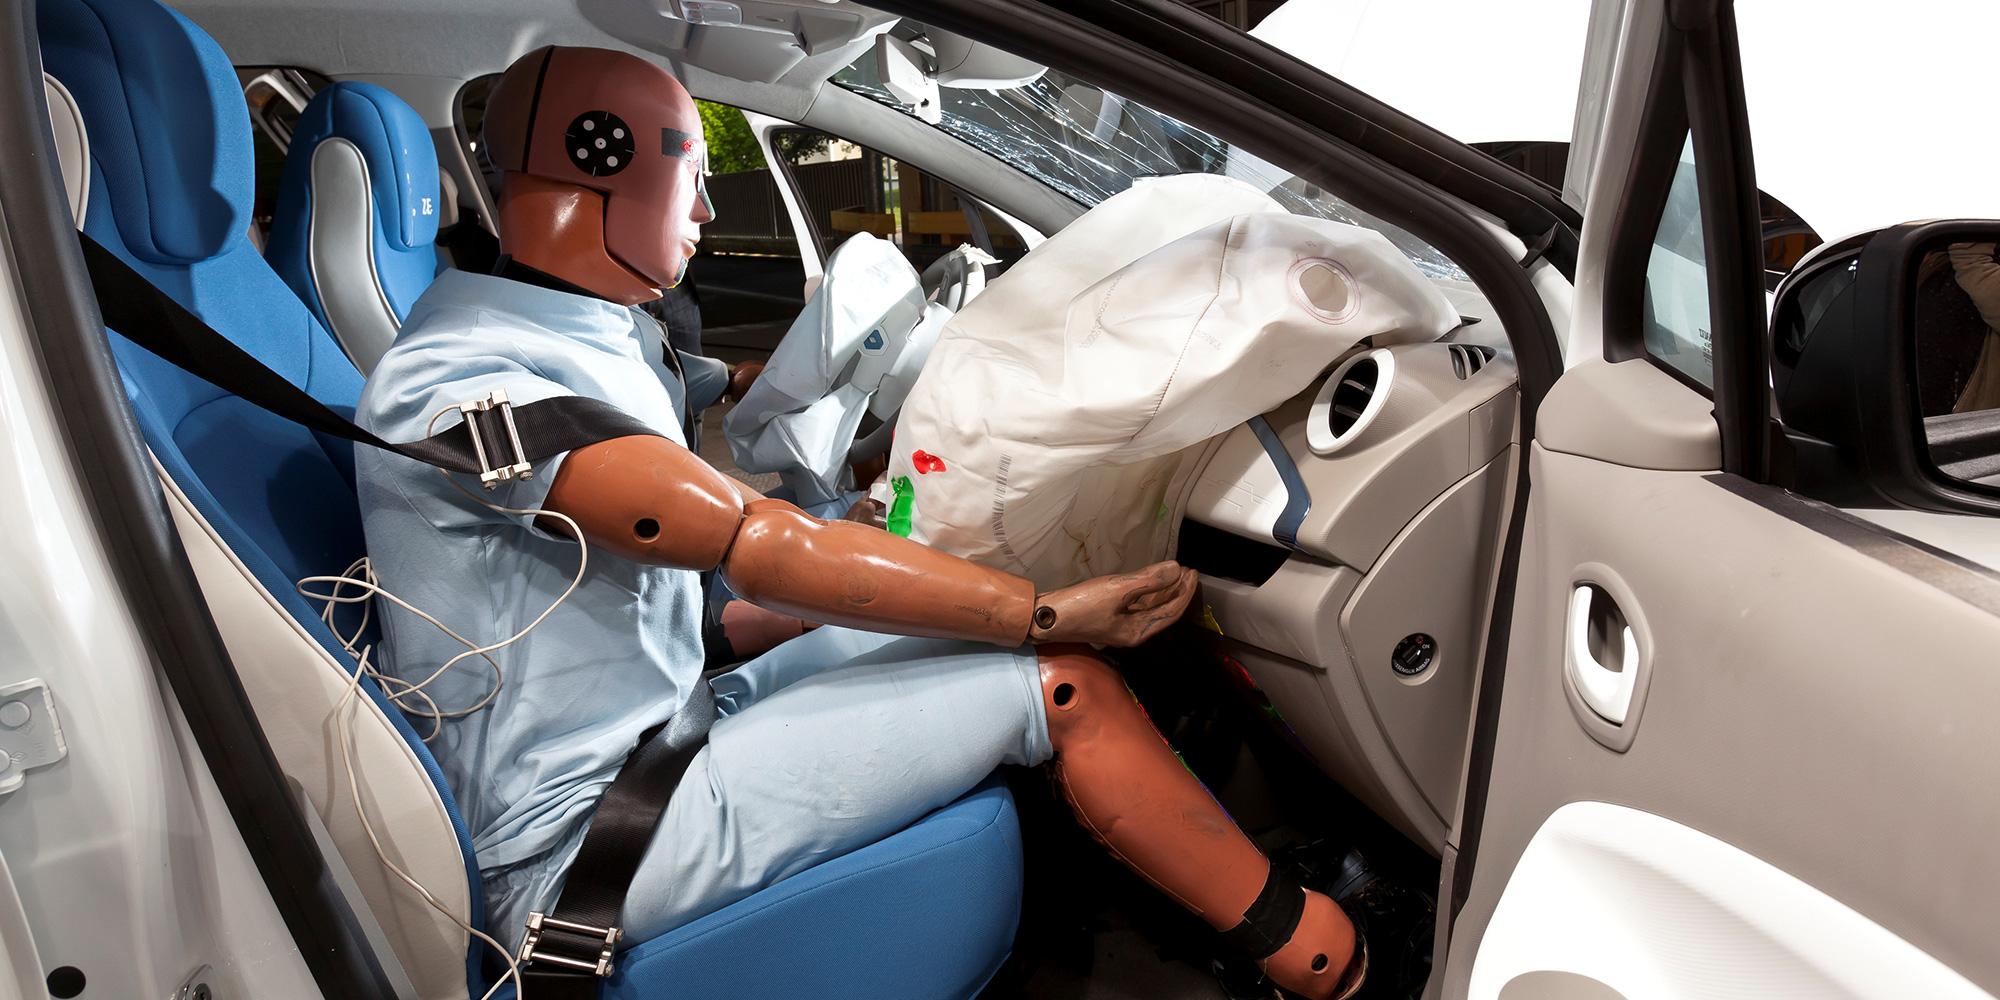 ZOE brillierte im Euro NCAP-Crashtest mit Top-Noten